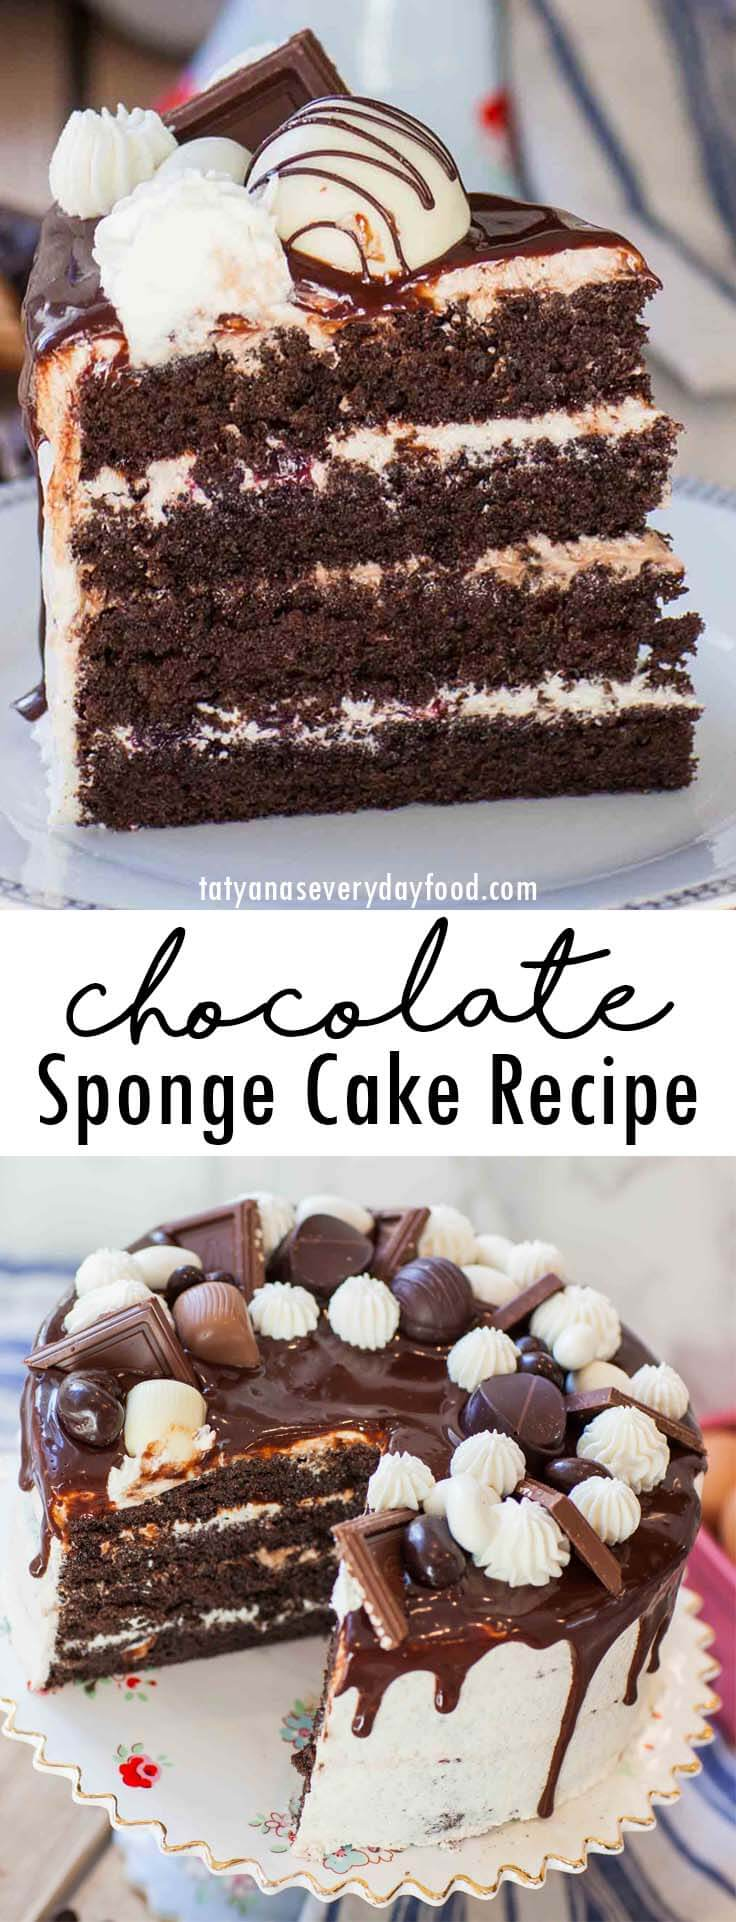 Chocolate Sponge Cake video recipe